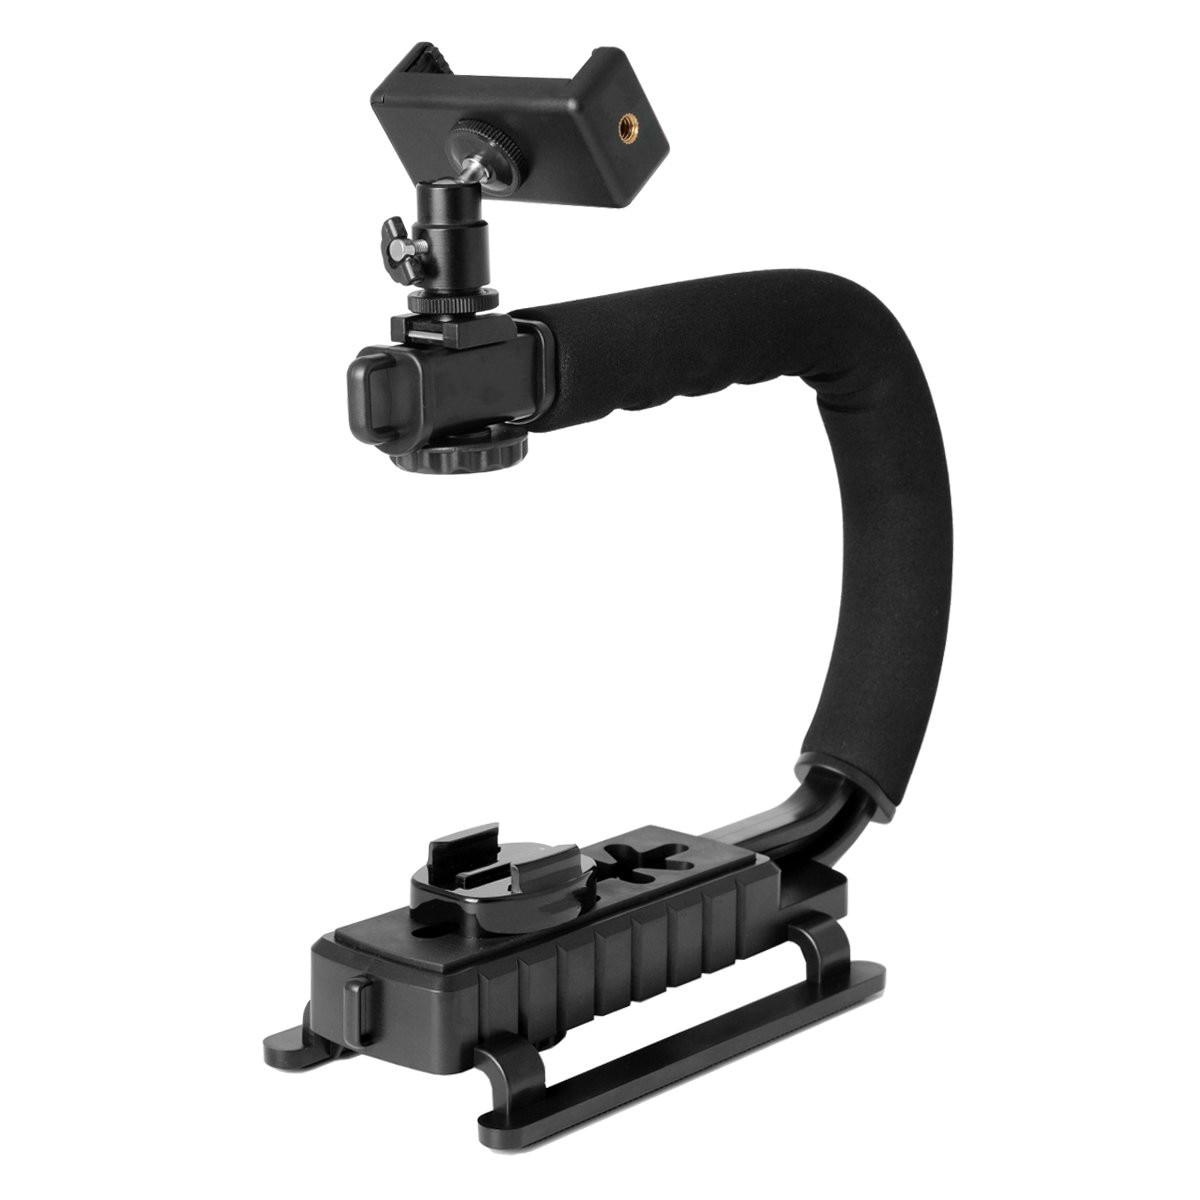 U-Rig Handheld Phone Stabilizing Photography Video Rig Film Making Vlogging Recording Case Bracket Stabilizer For IPhone Samsung